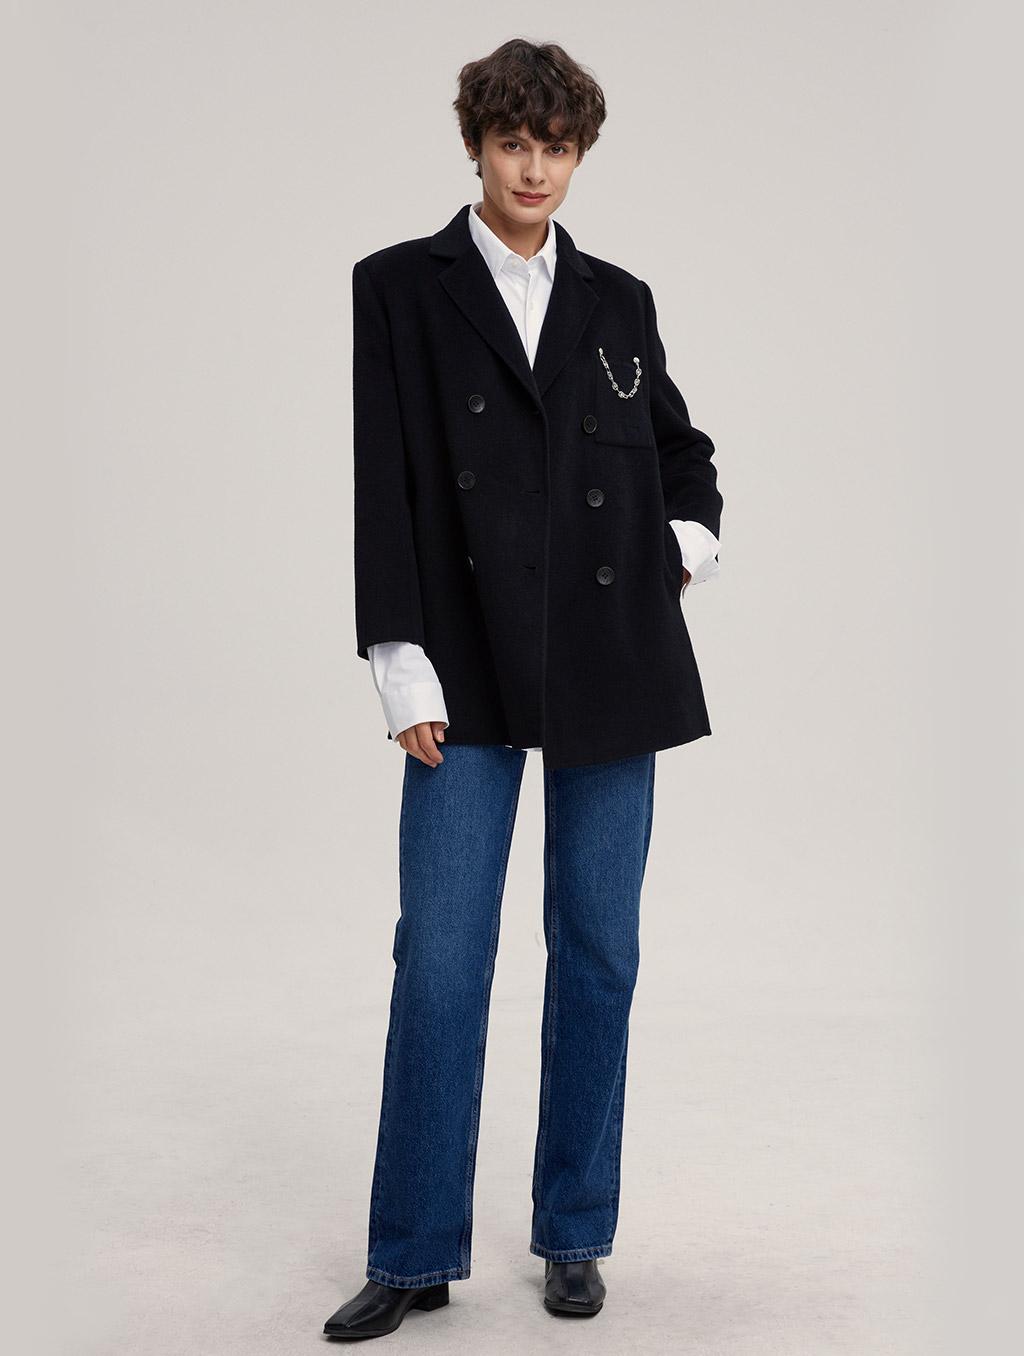 Waisted 100% Camel Hair Coat With Badge-whole body-black